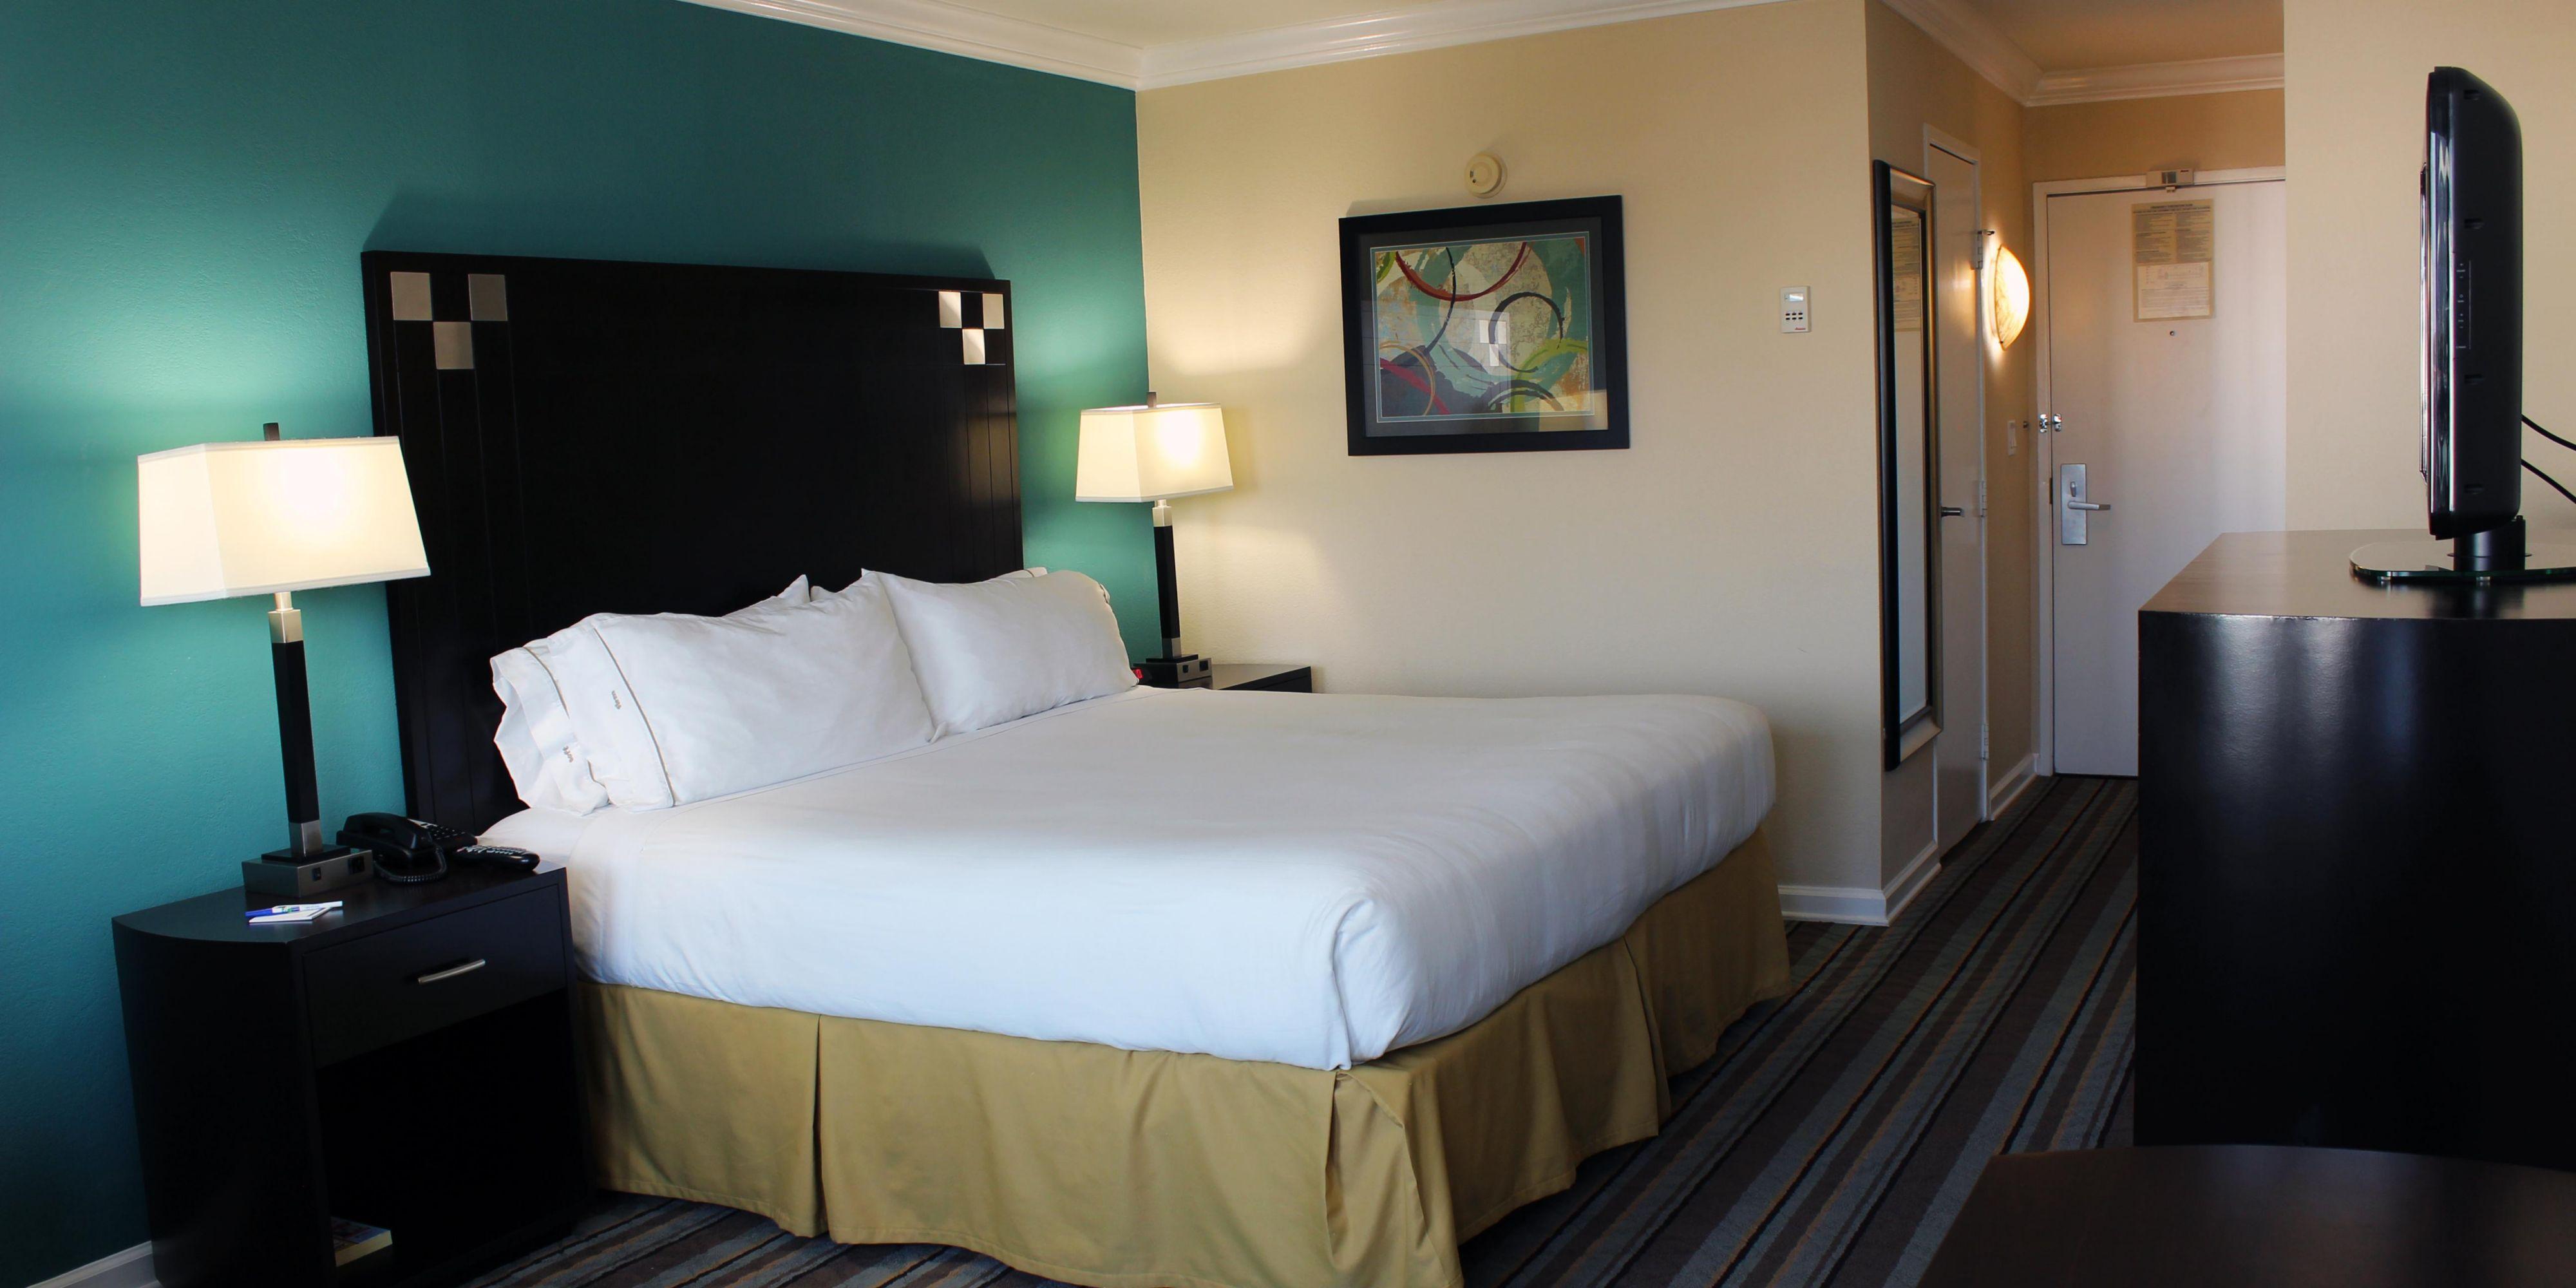 Holiday Inn Express Van Nuys 3977050418 2x1